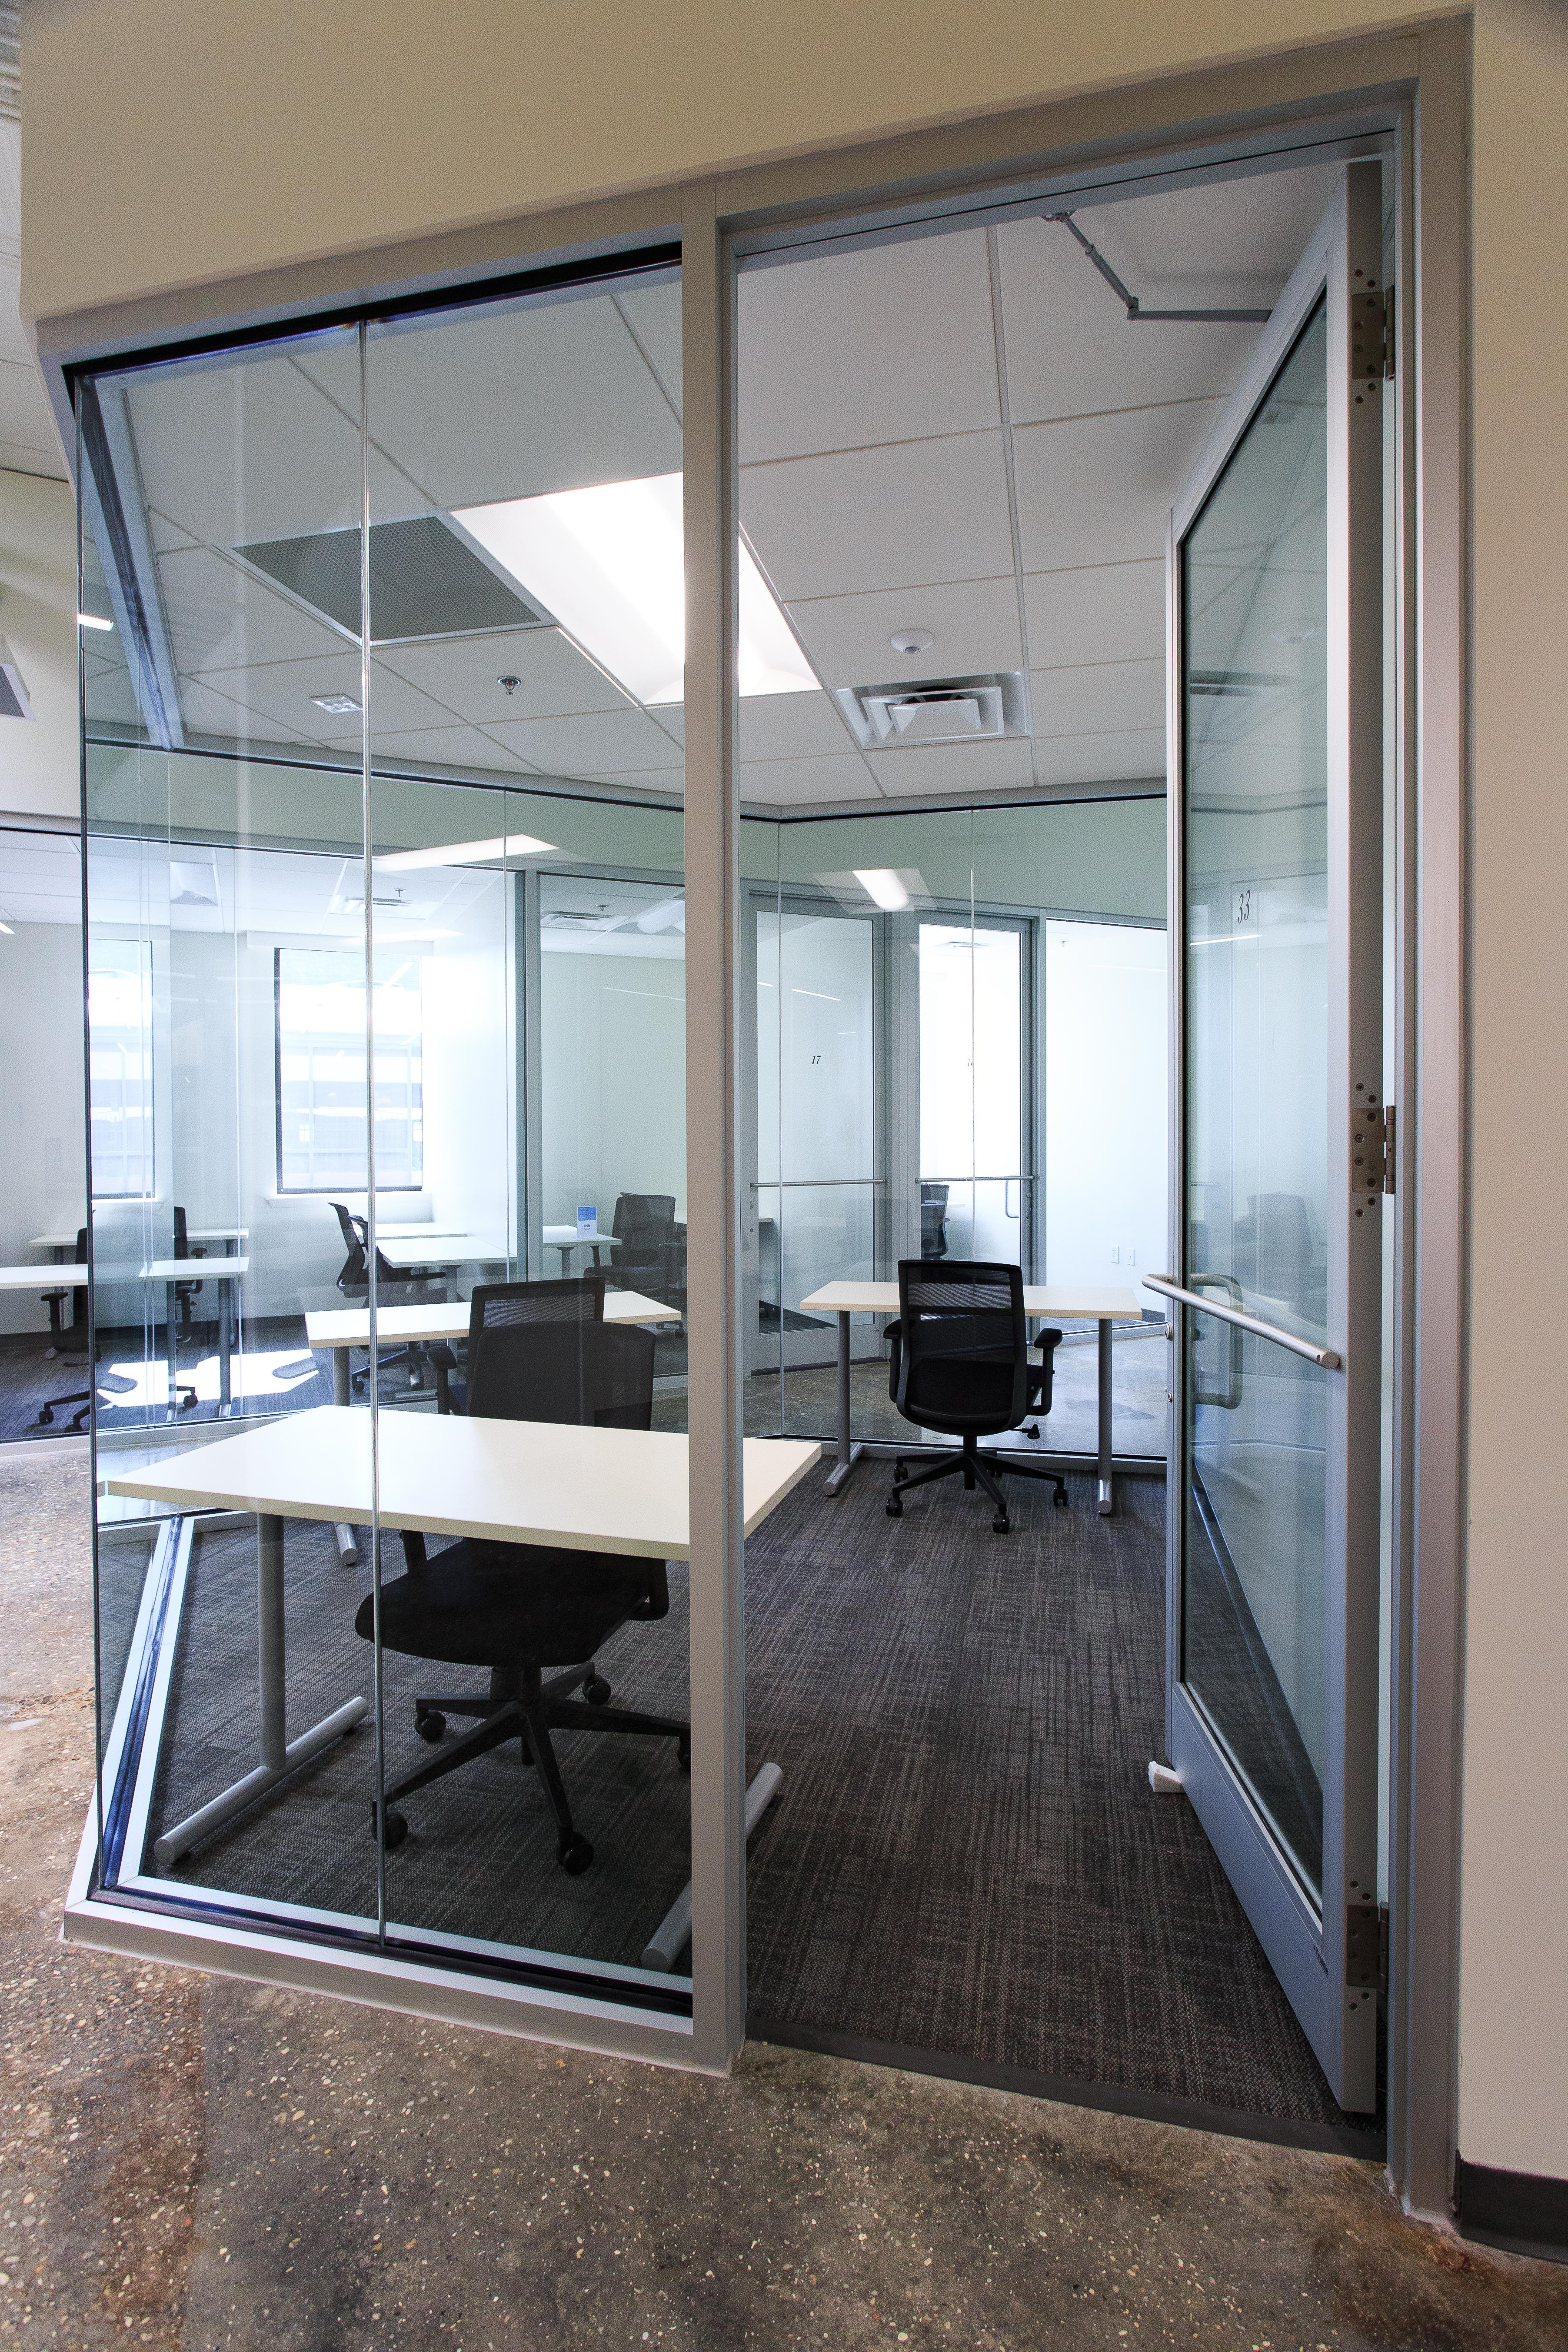 SharedSpace Augusta - Medium Private Office (3 - 4 People)